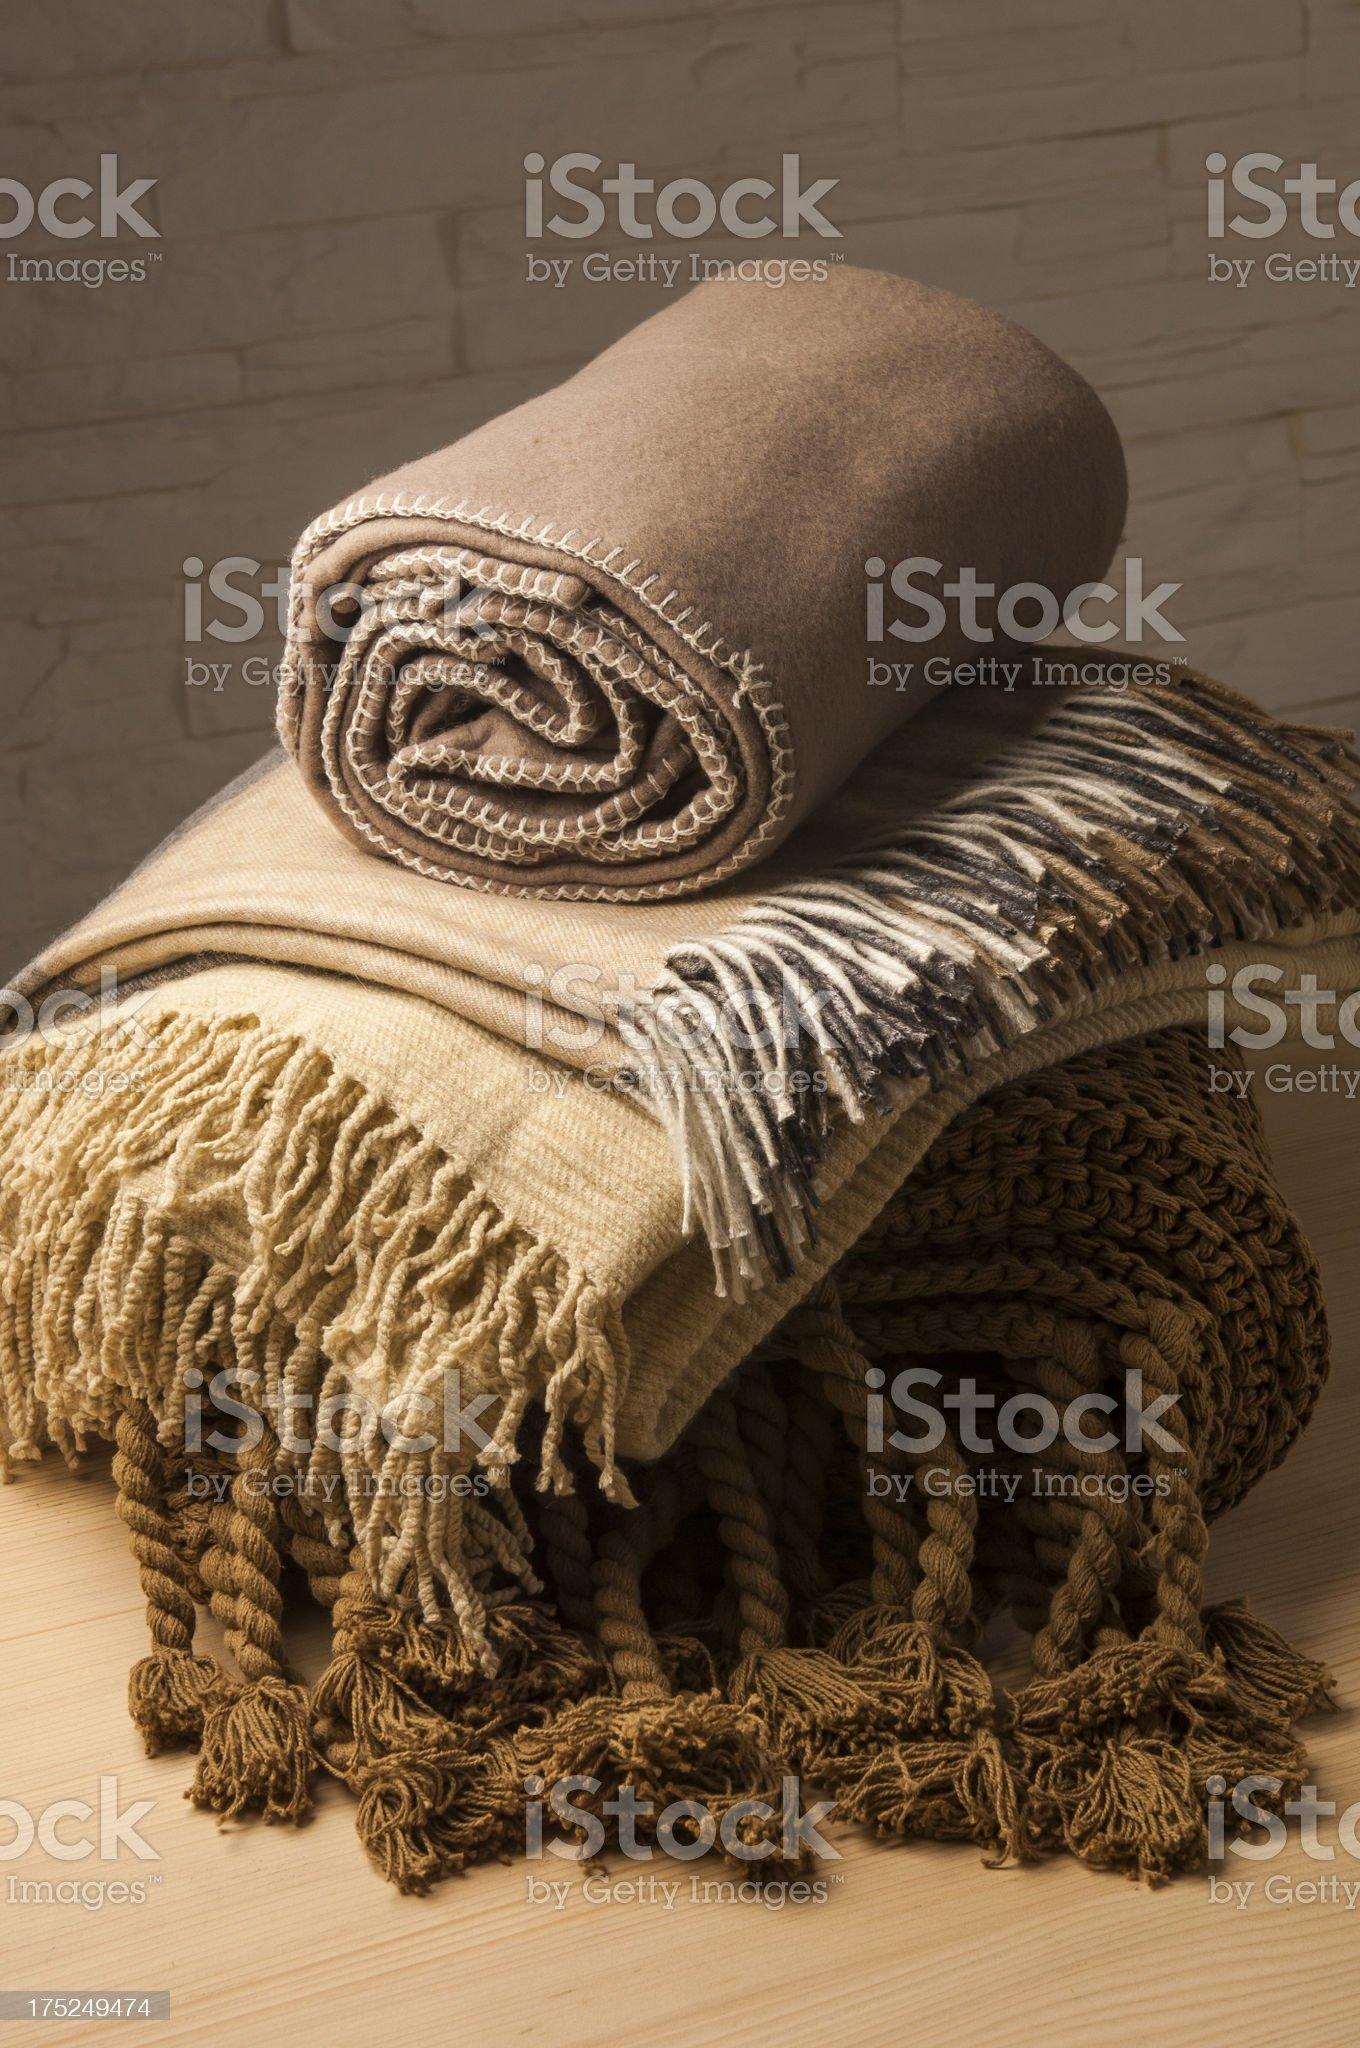 blankets royalty-free stock photo